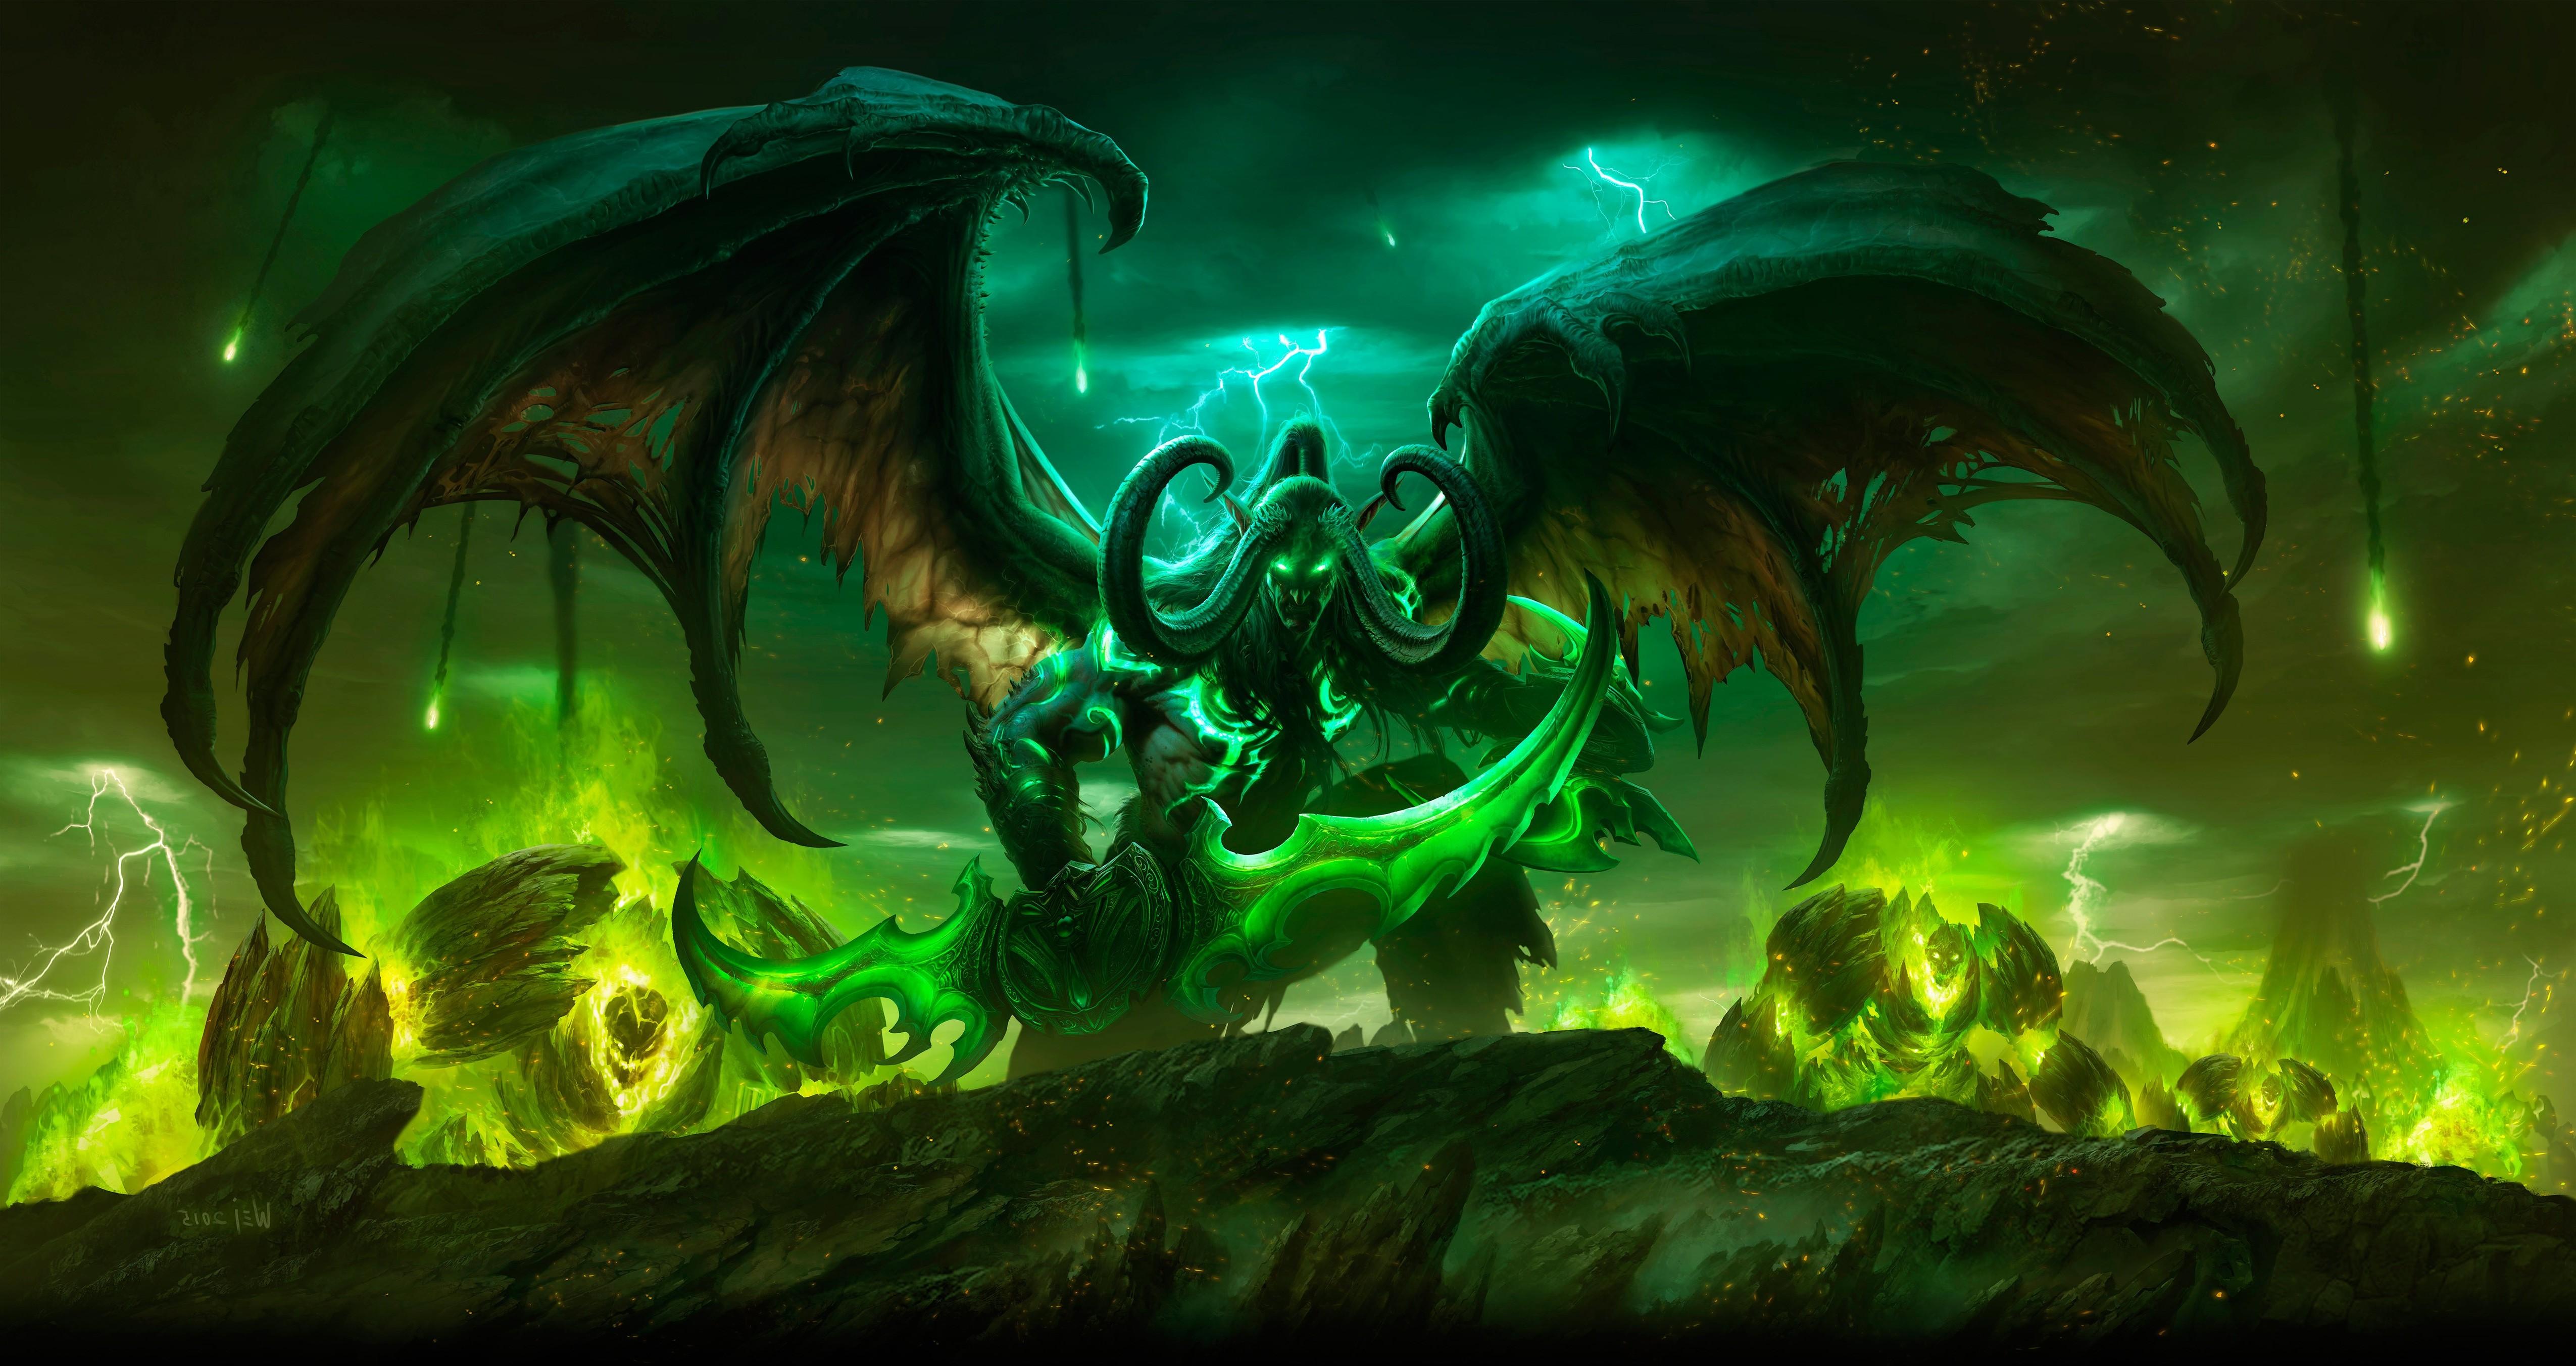 Wallpaper 5100x2705 Px World Of Warcraft Legion 5100x2705